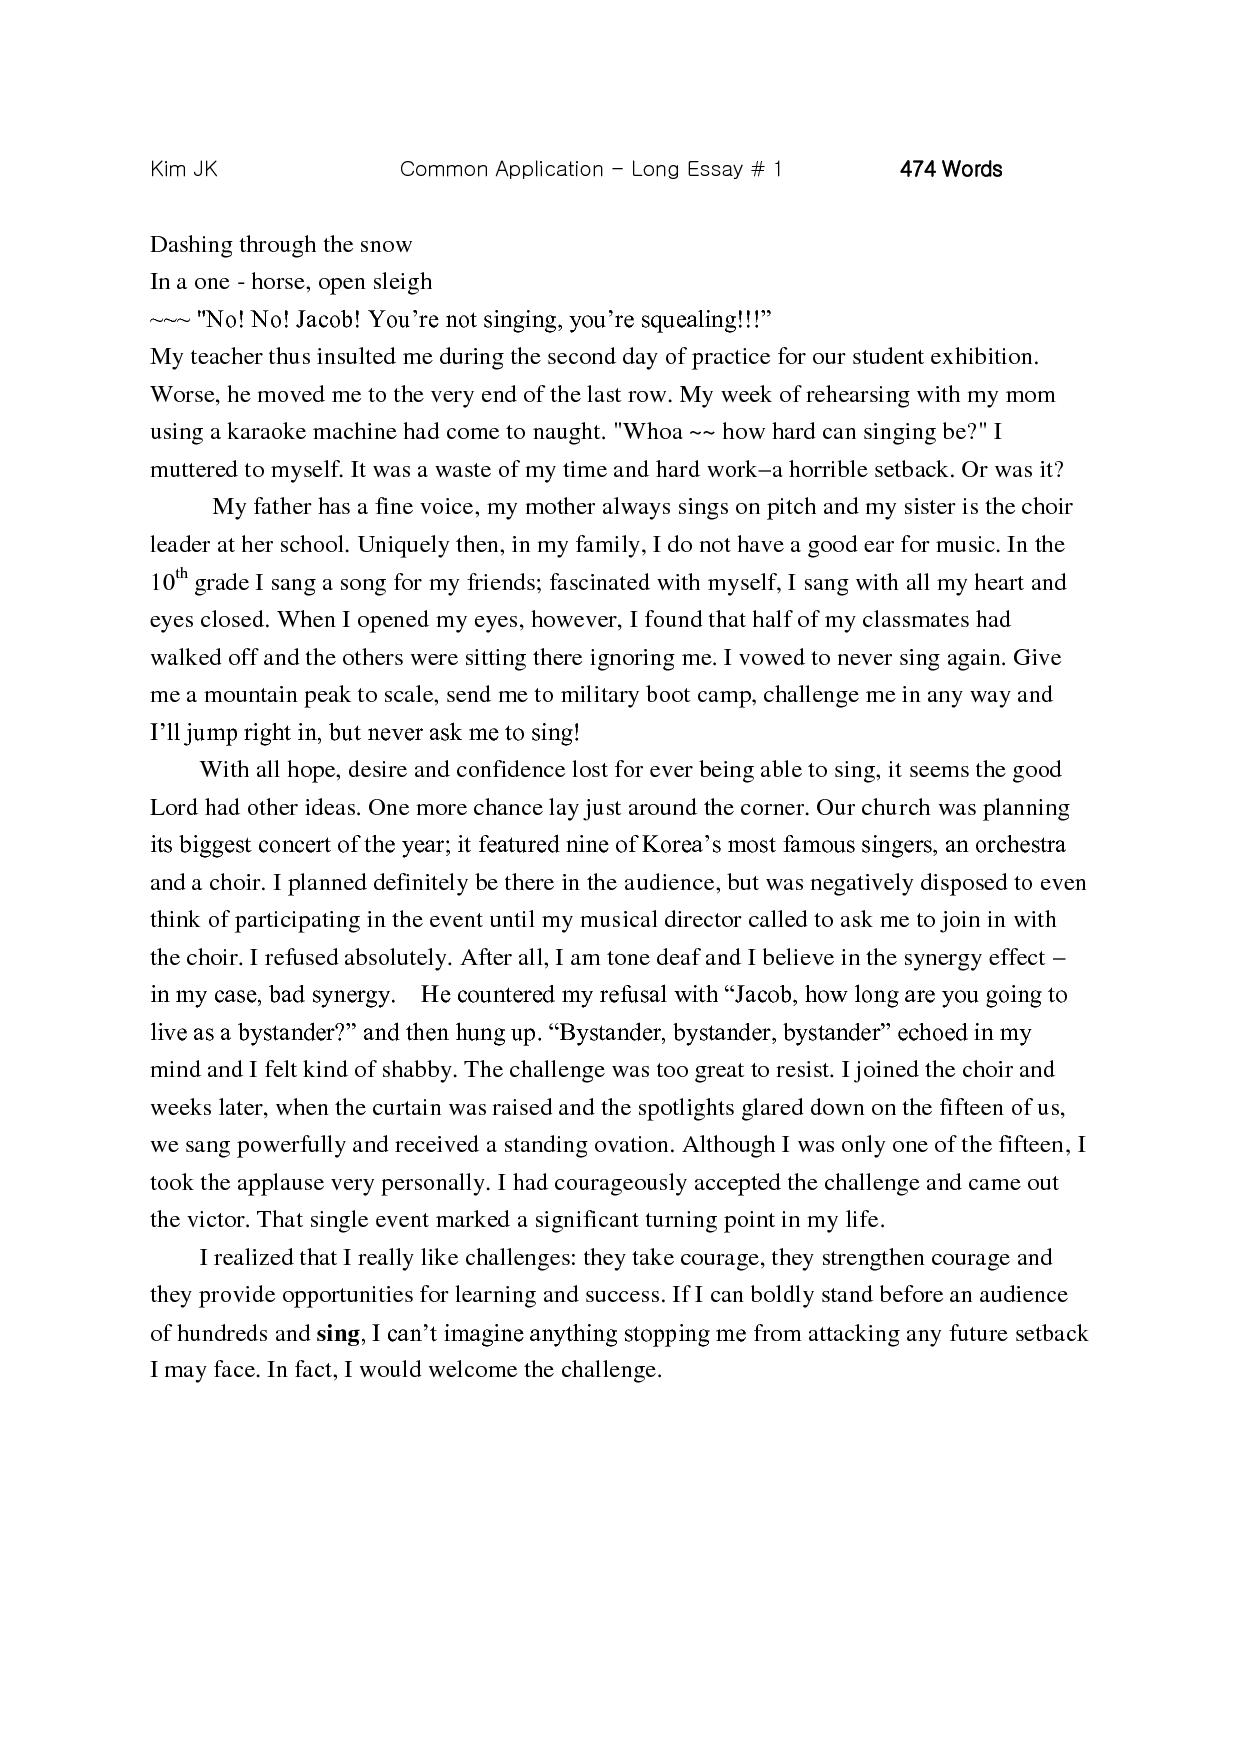 001 Brilliant Ideas Of College Application Essayples Format Targer Golden Dragon Fantastic Good Common App Essays Best Magnificent 2018 Ivy League New York Times Full